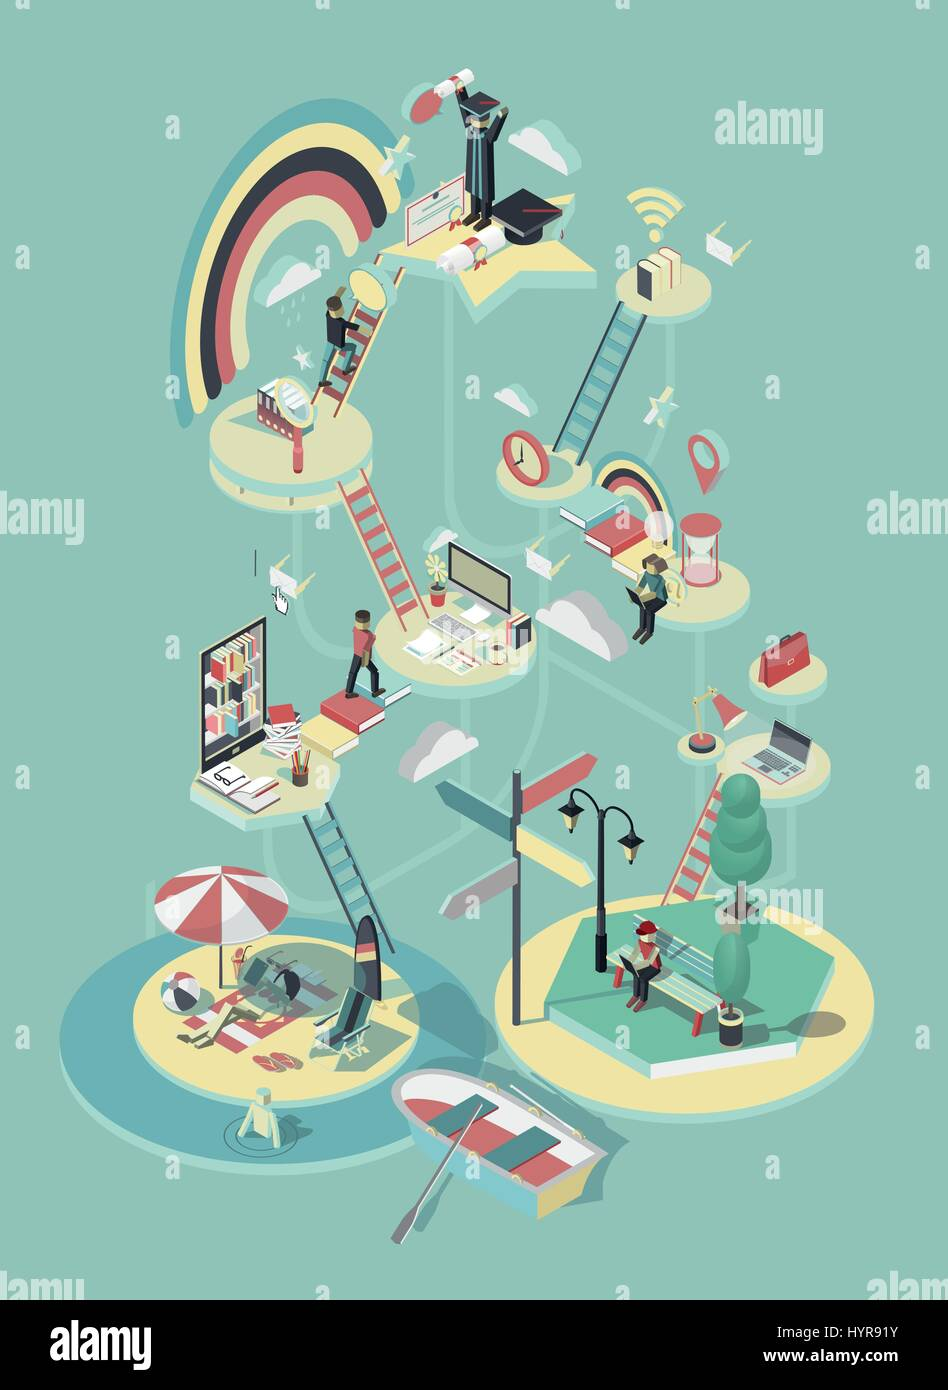 Poster design online free download - 3d Isometric Vector Design Online Education Poster